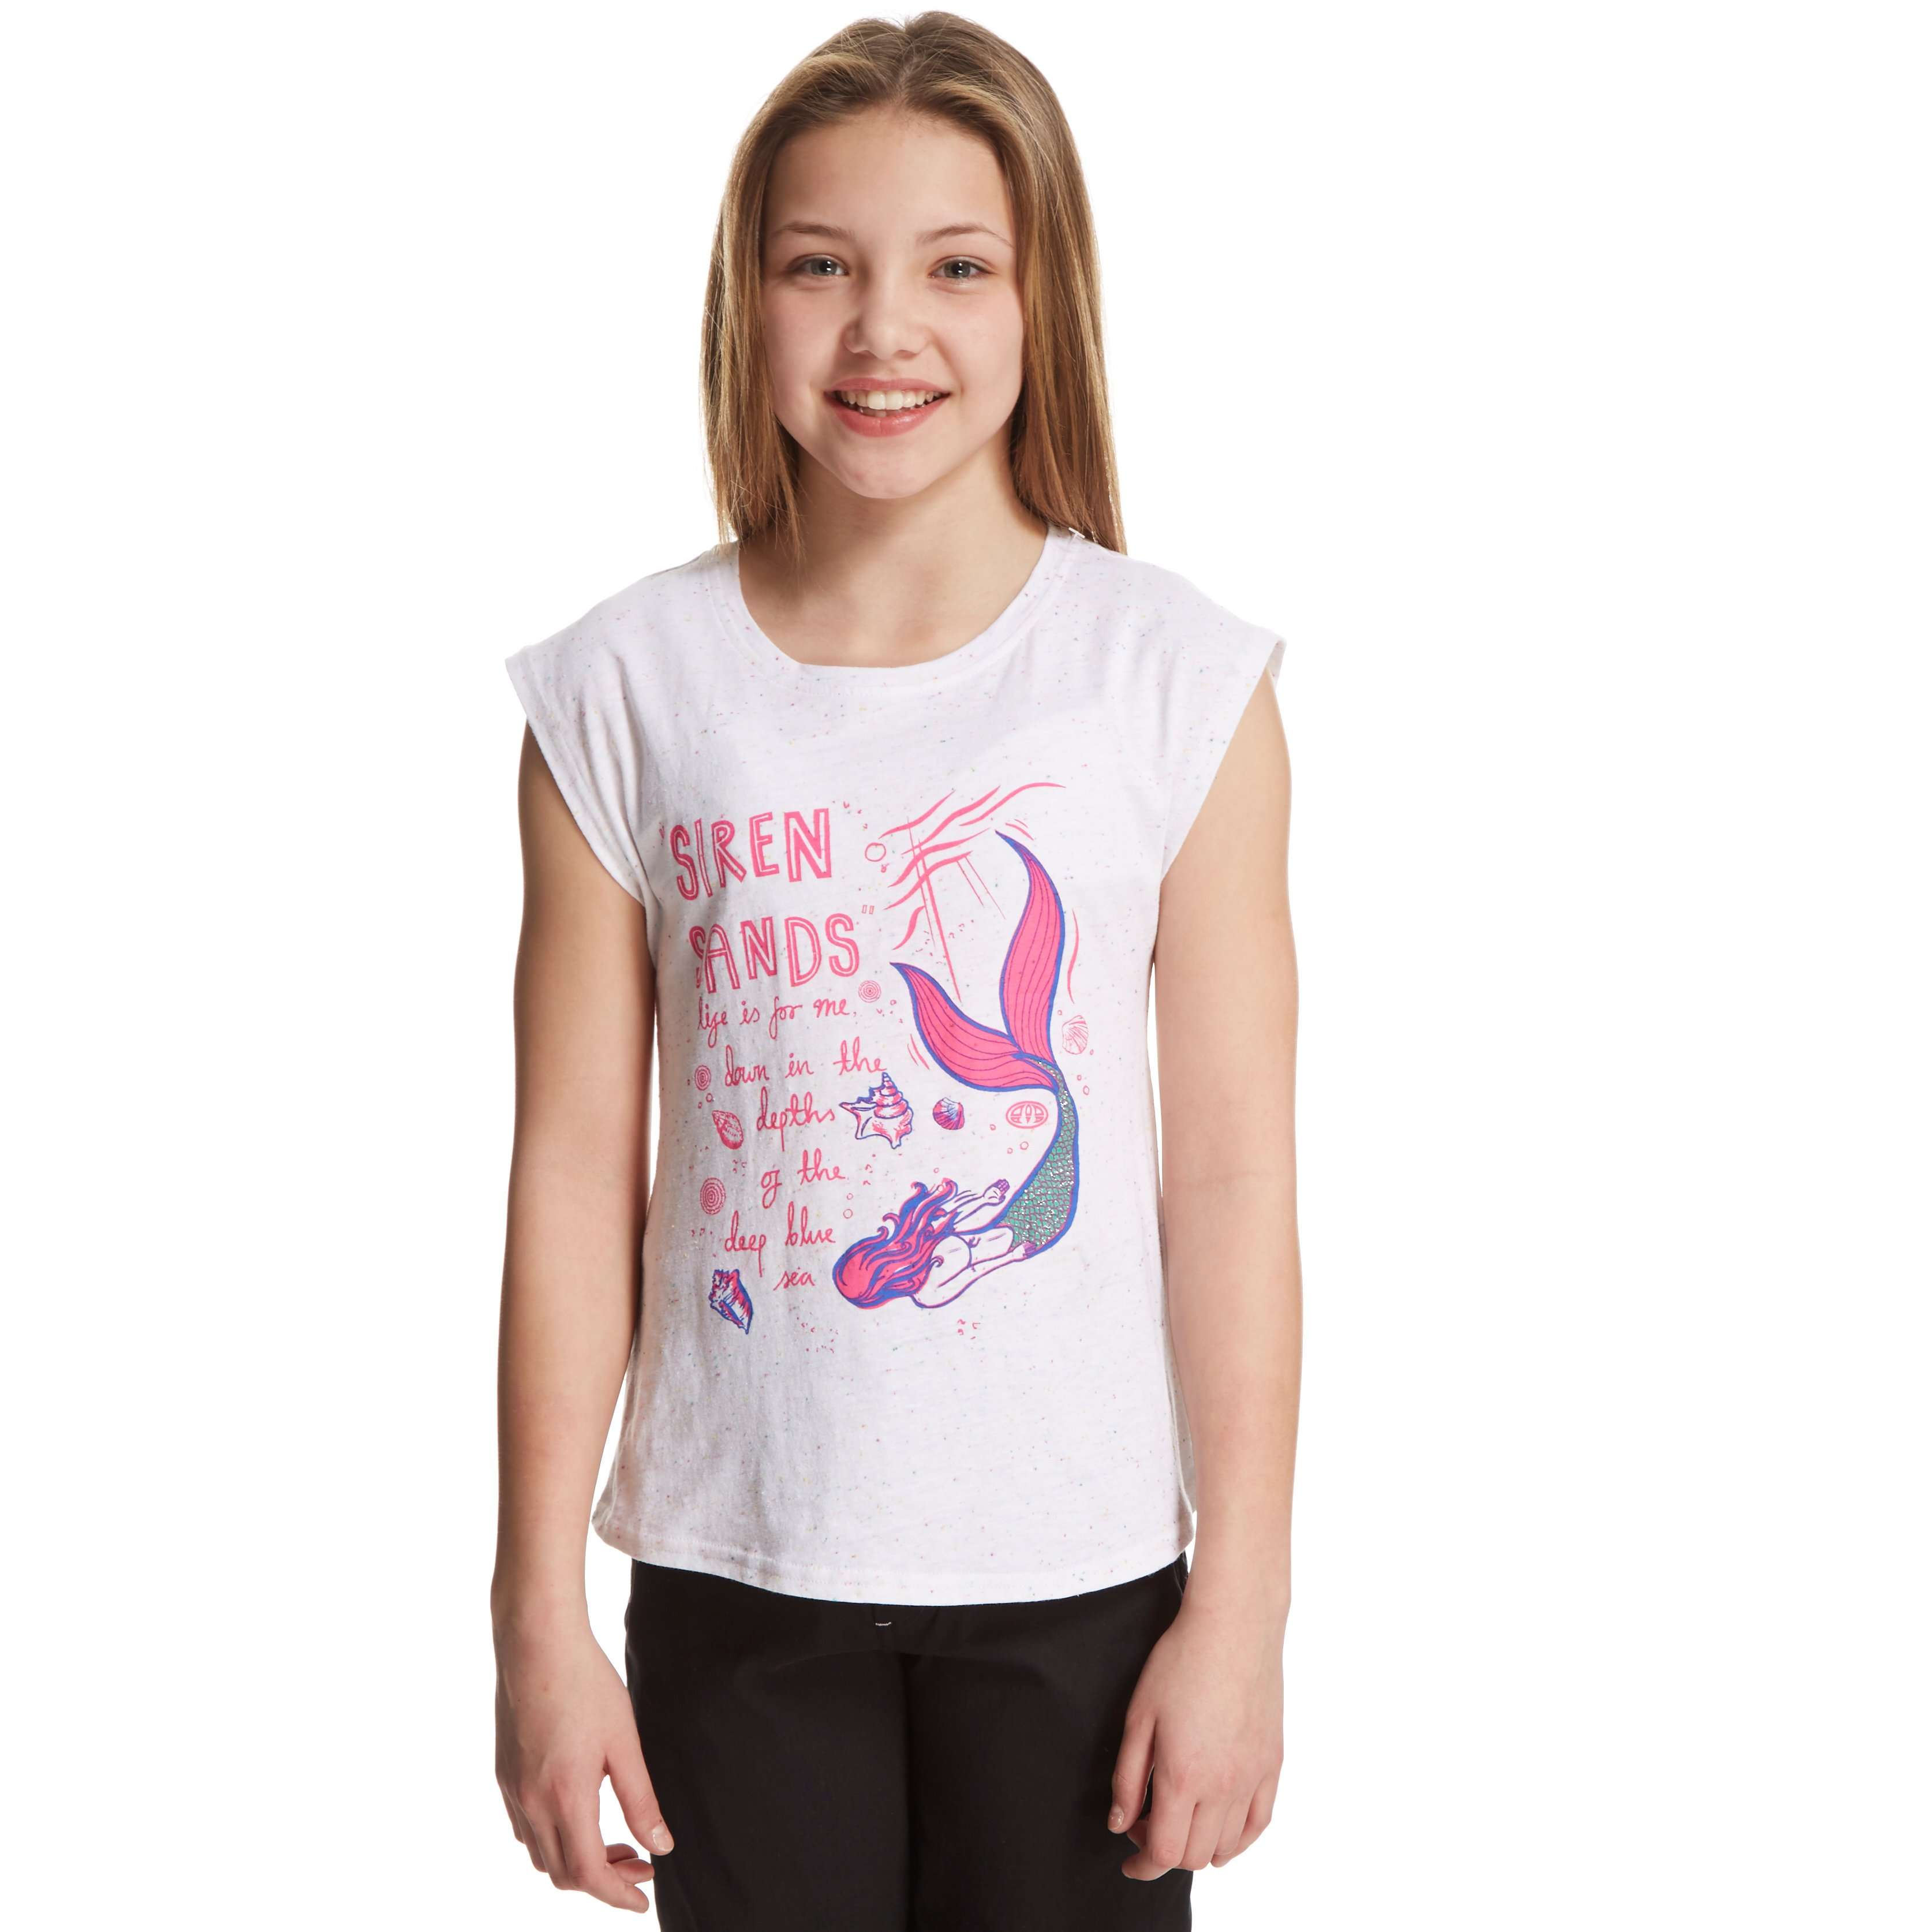 ANIMAL Girls' Siren Sands T-Shirt